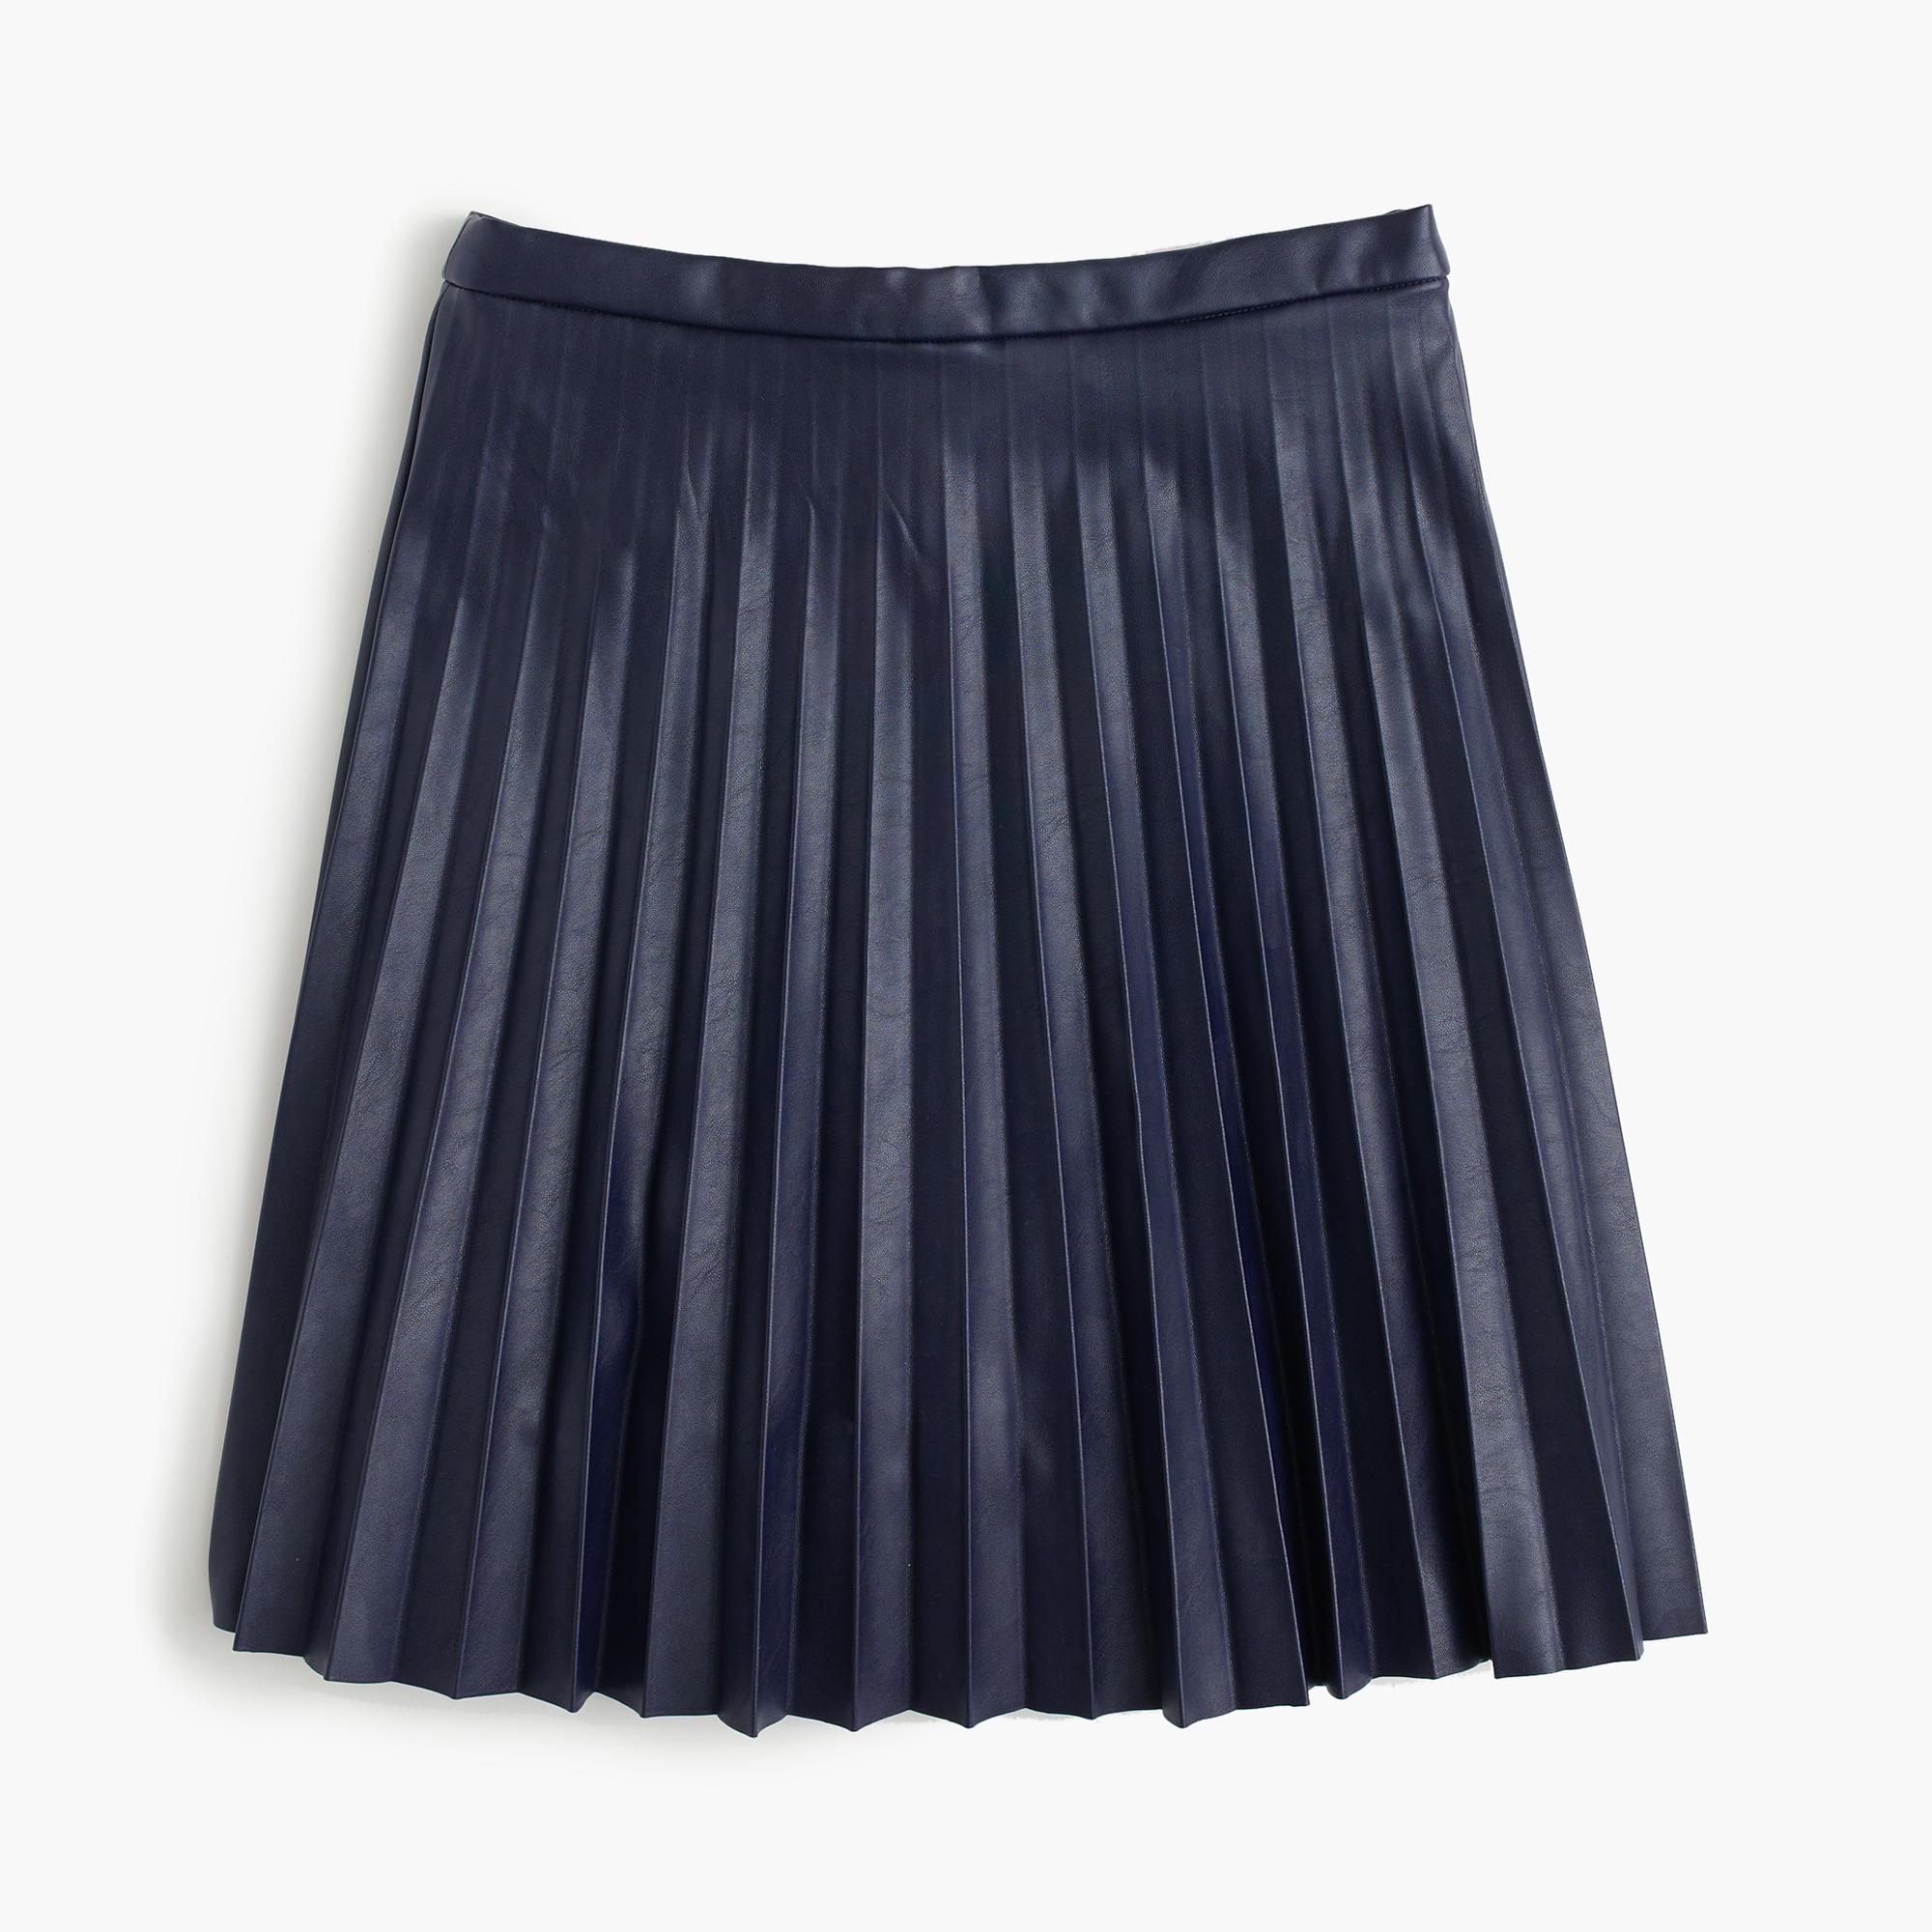 Tall Faux-Leather Pleated Mini Skirt : Women's Skirts | J.Crew